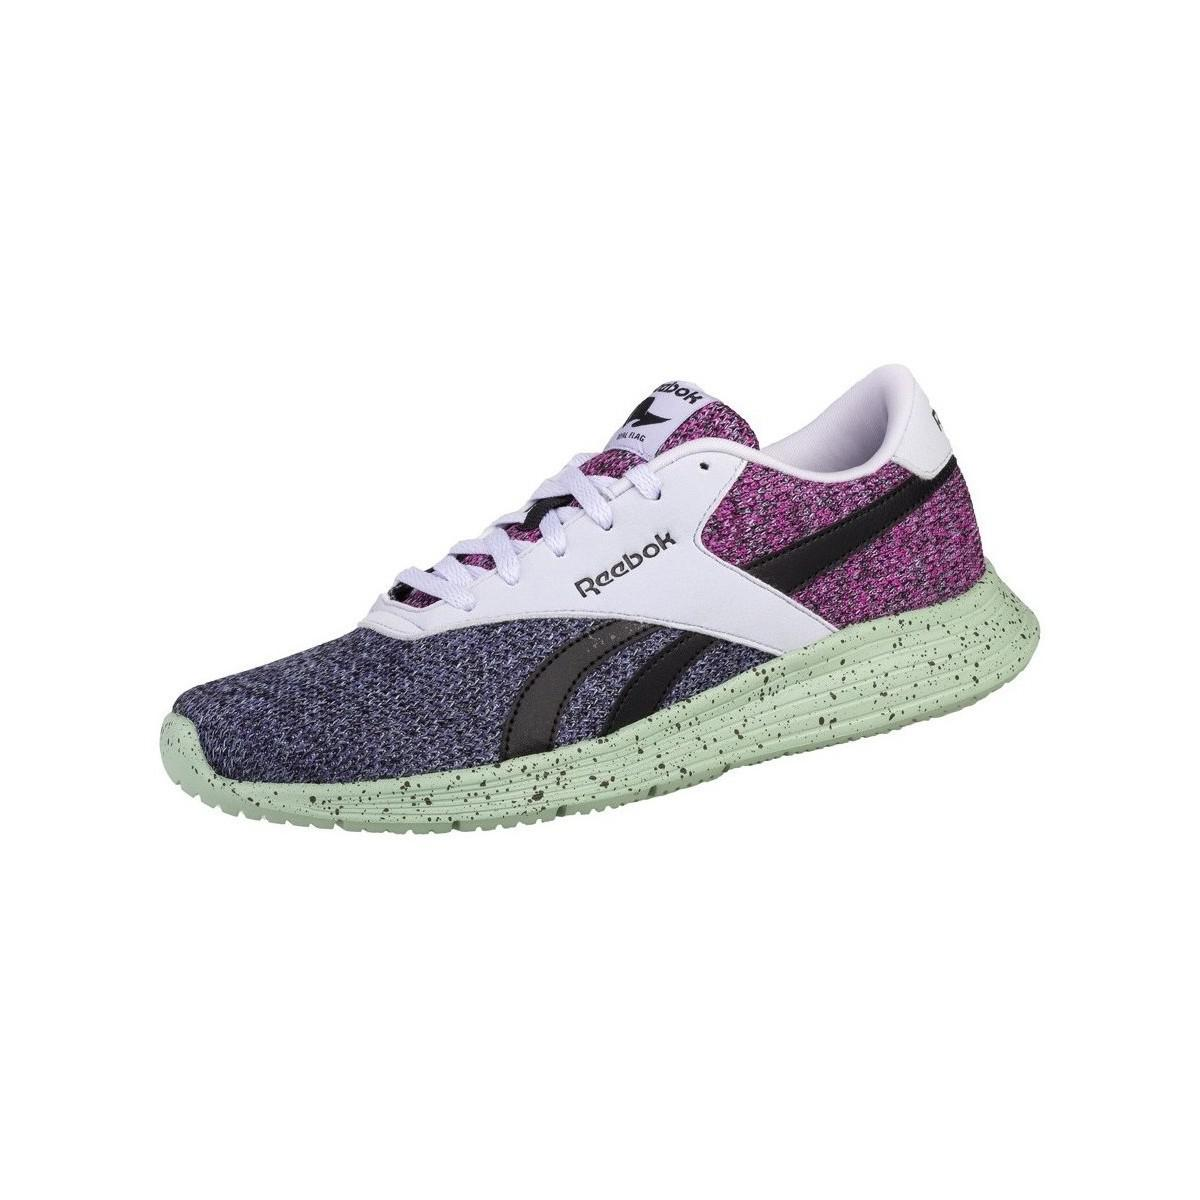 Reebok Royal Ec Ride Fs Women s Shoes (trainers) In Multicolour - Lyst 66991bbab